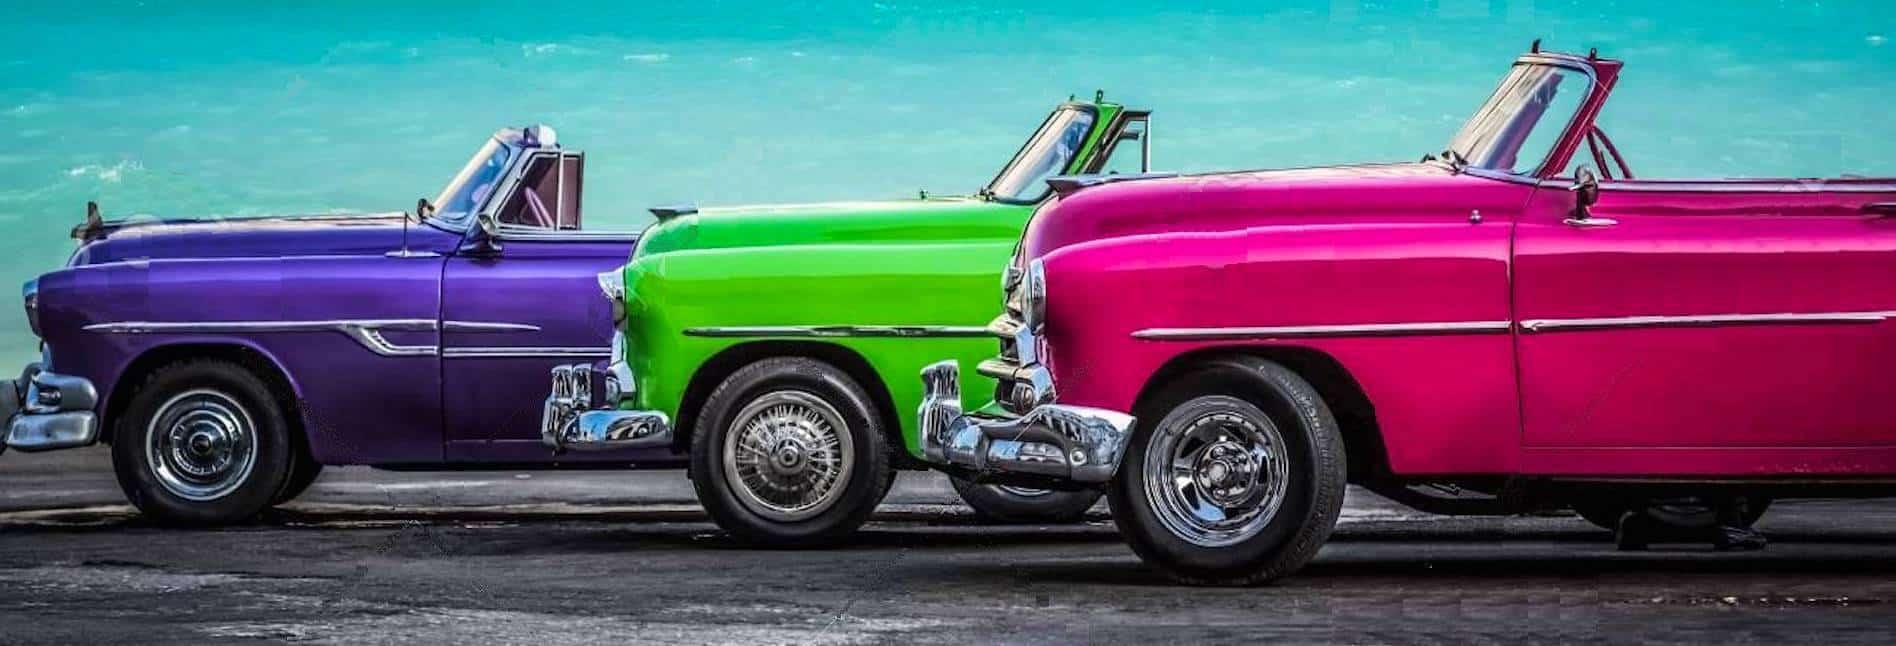 Antique Convertible Cars Cuba